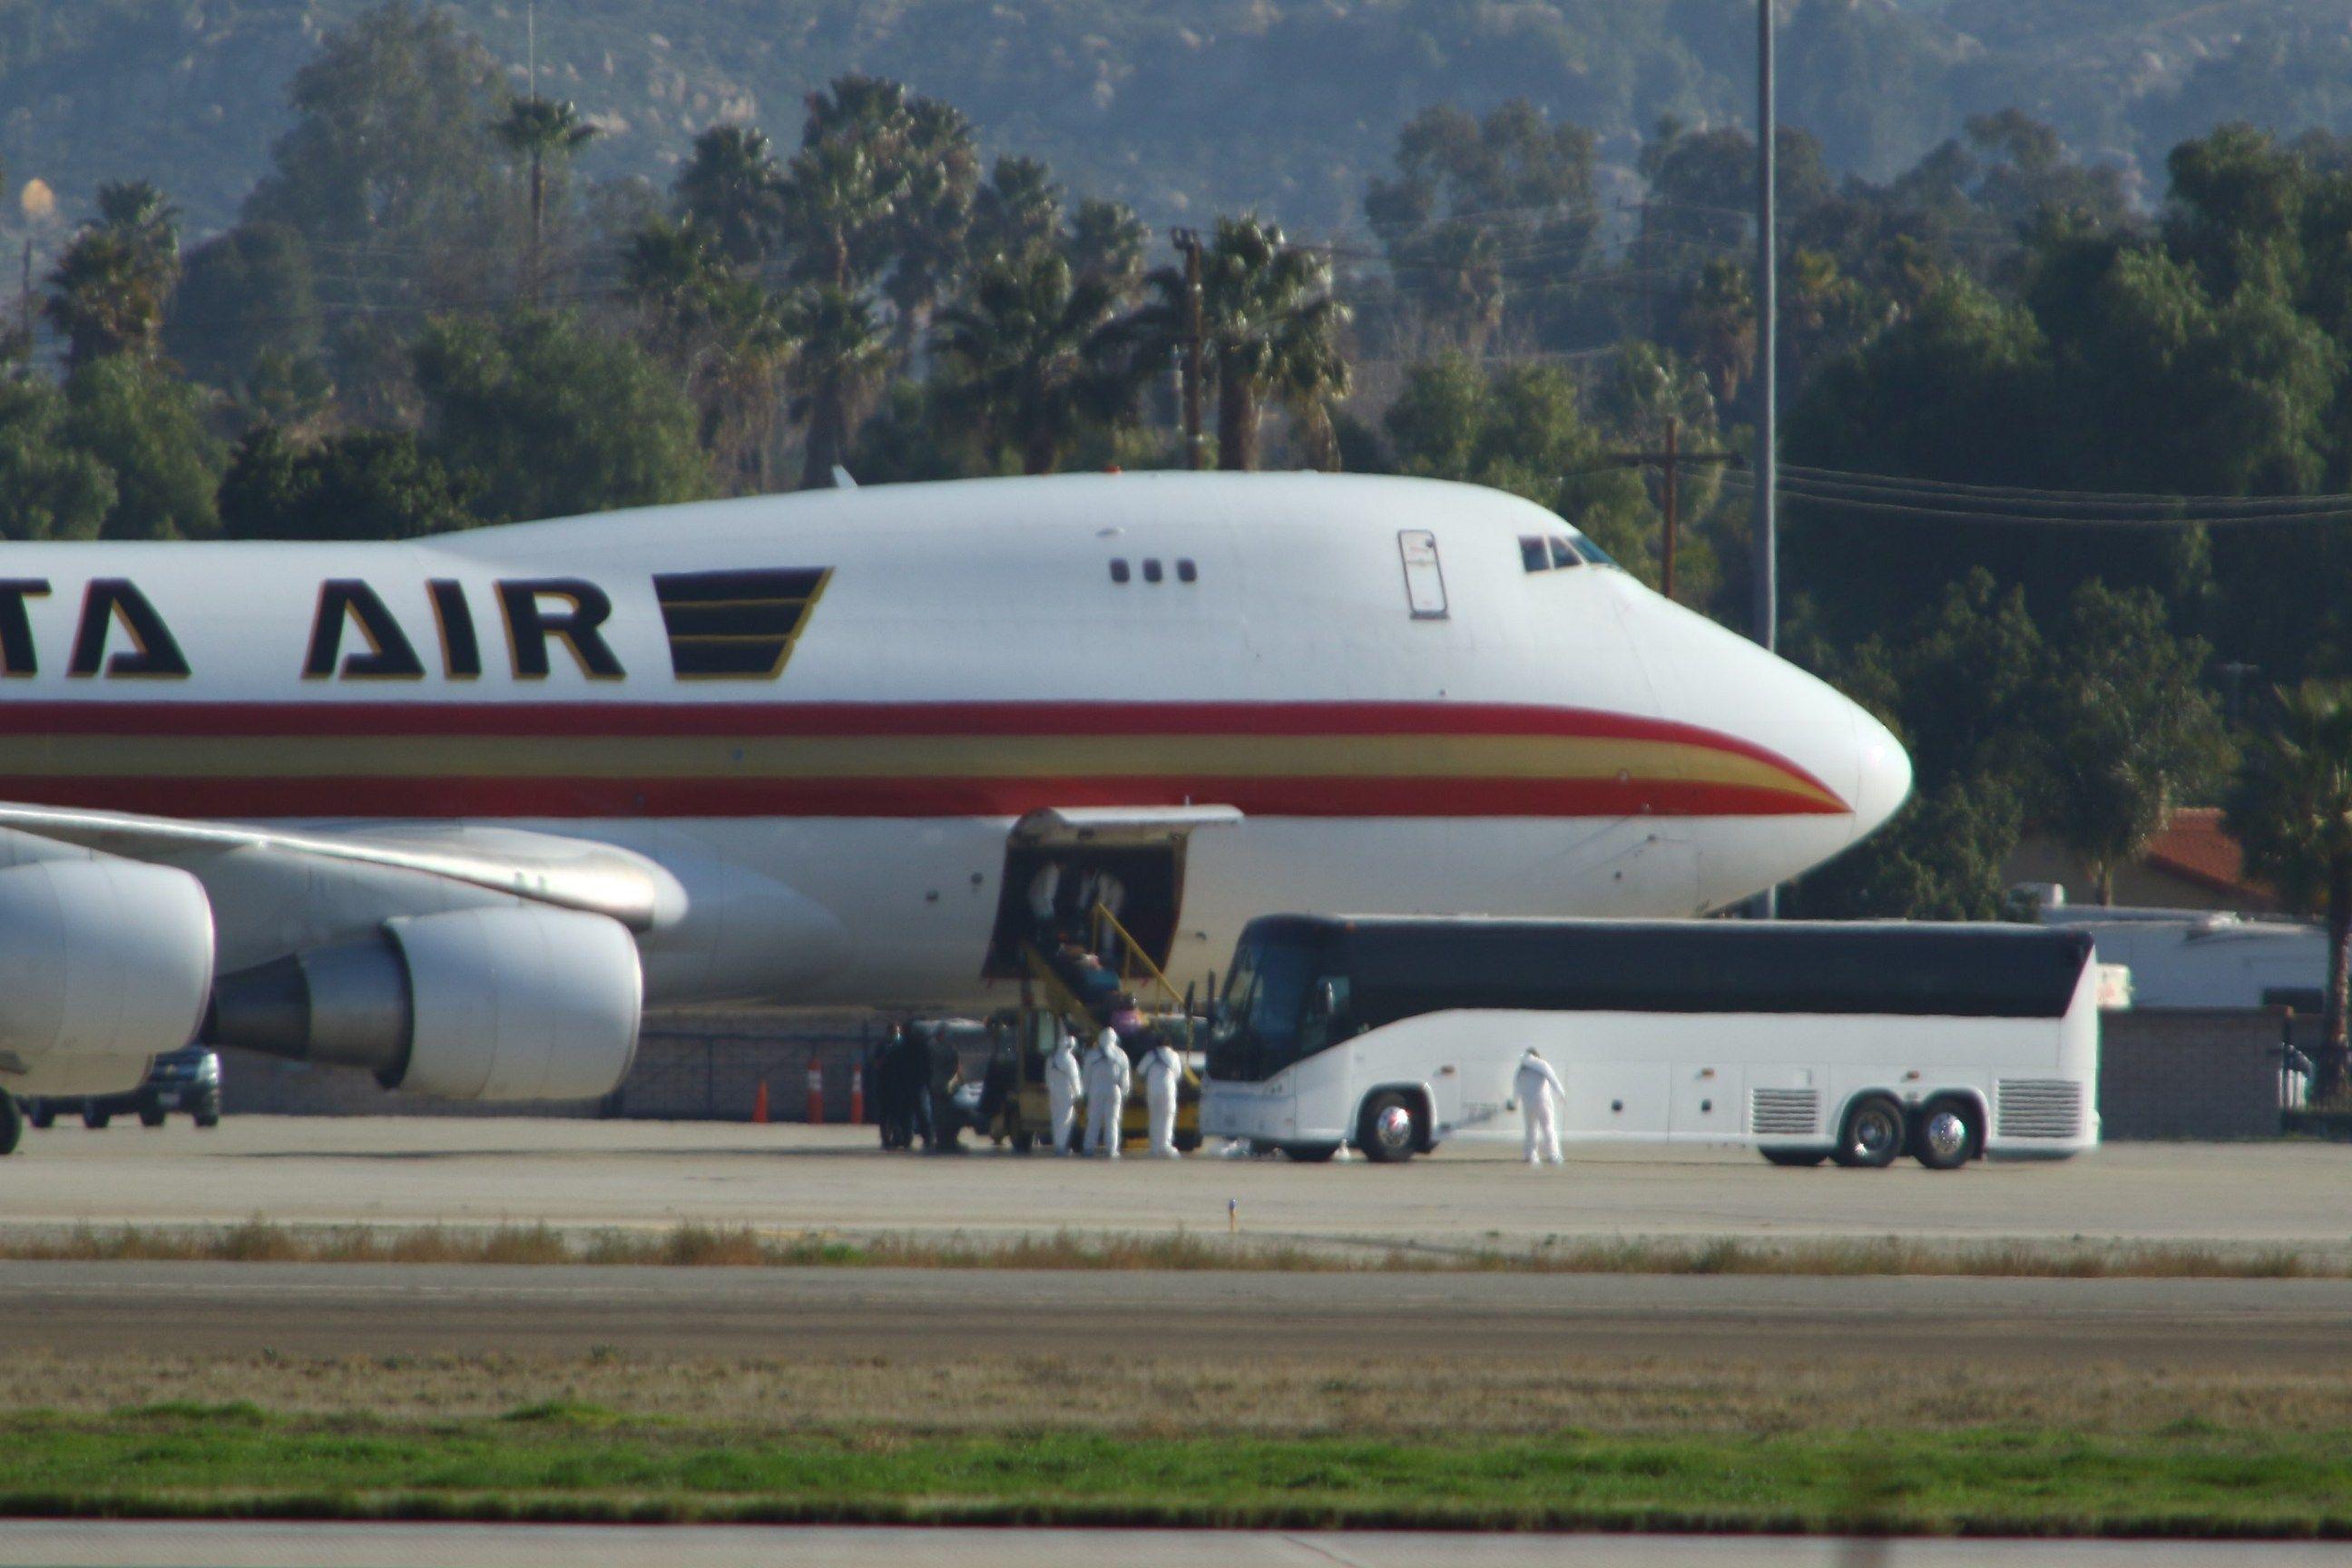 U.S. evacuee with coronavirus initially discharged from hospital - Axios